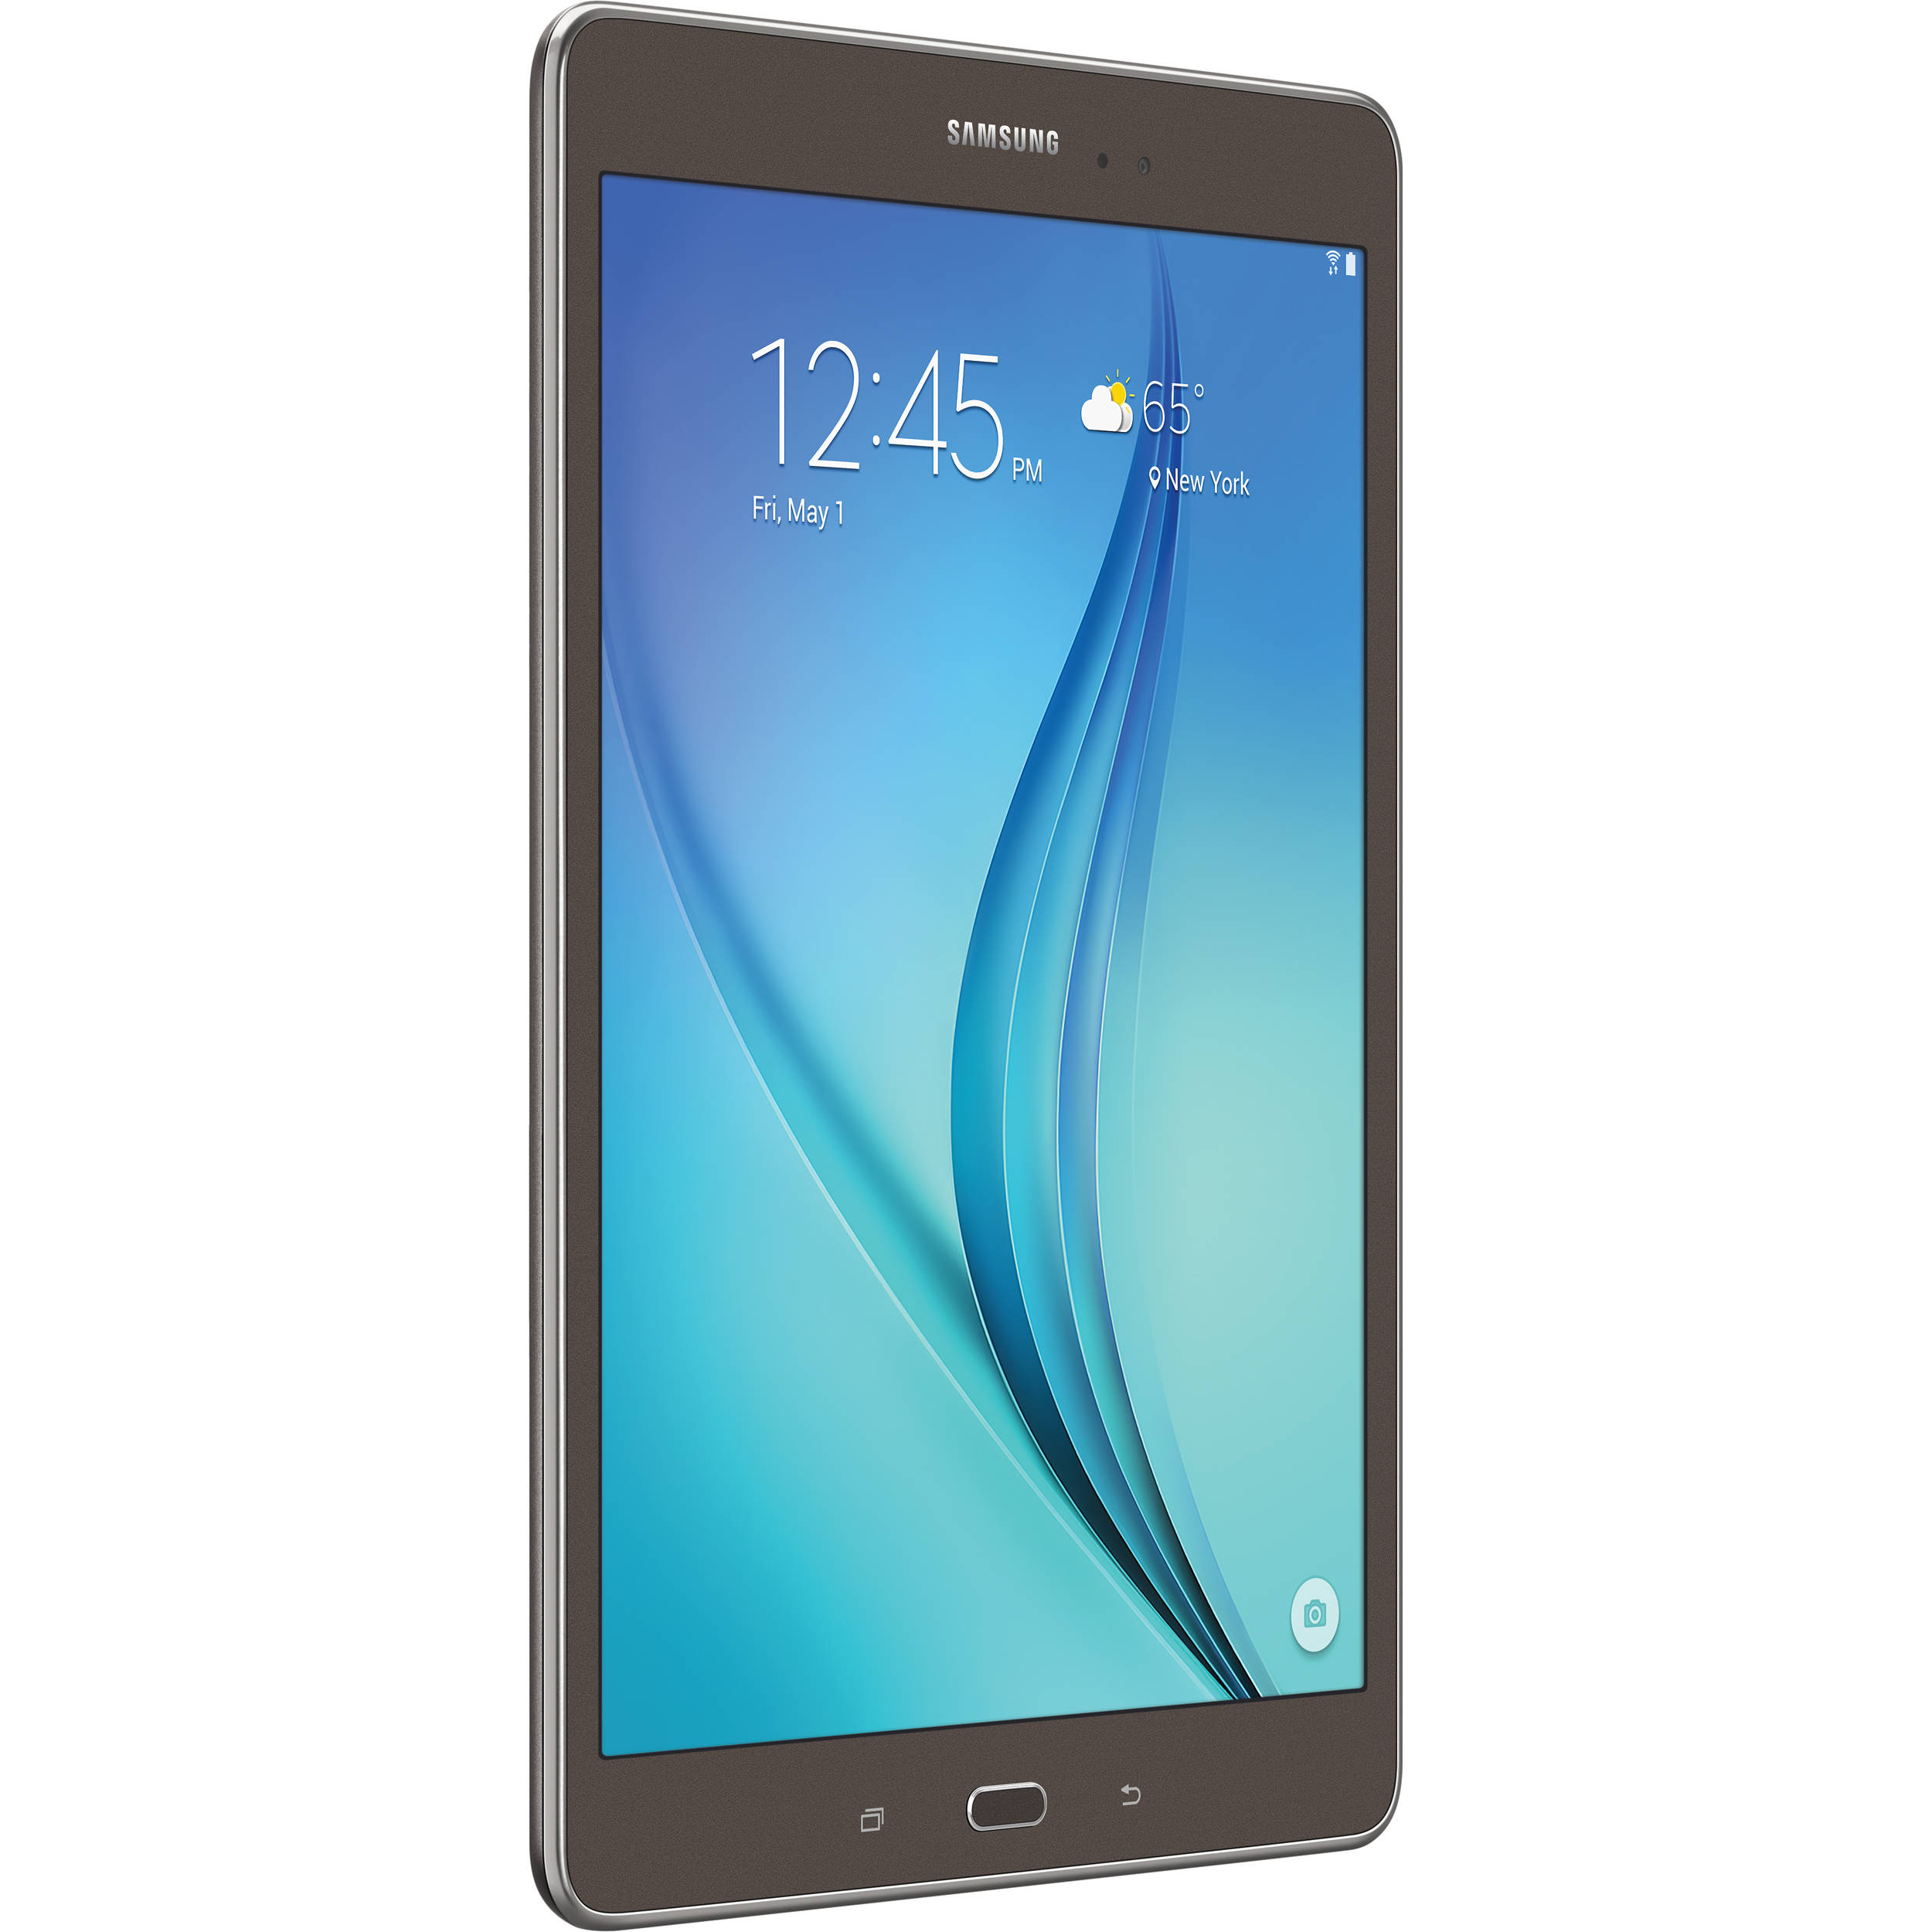 "Samsung 16GB Galaxy Tab A 9.7"" Wi-Fi Tablet SM-P550NZAAXAR"